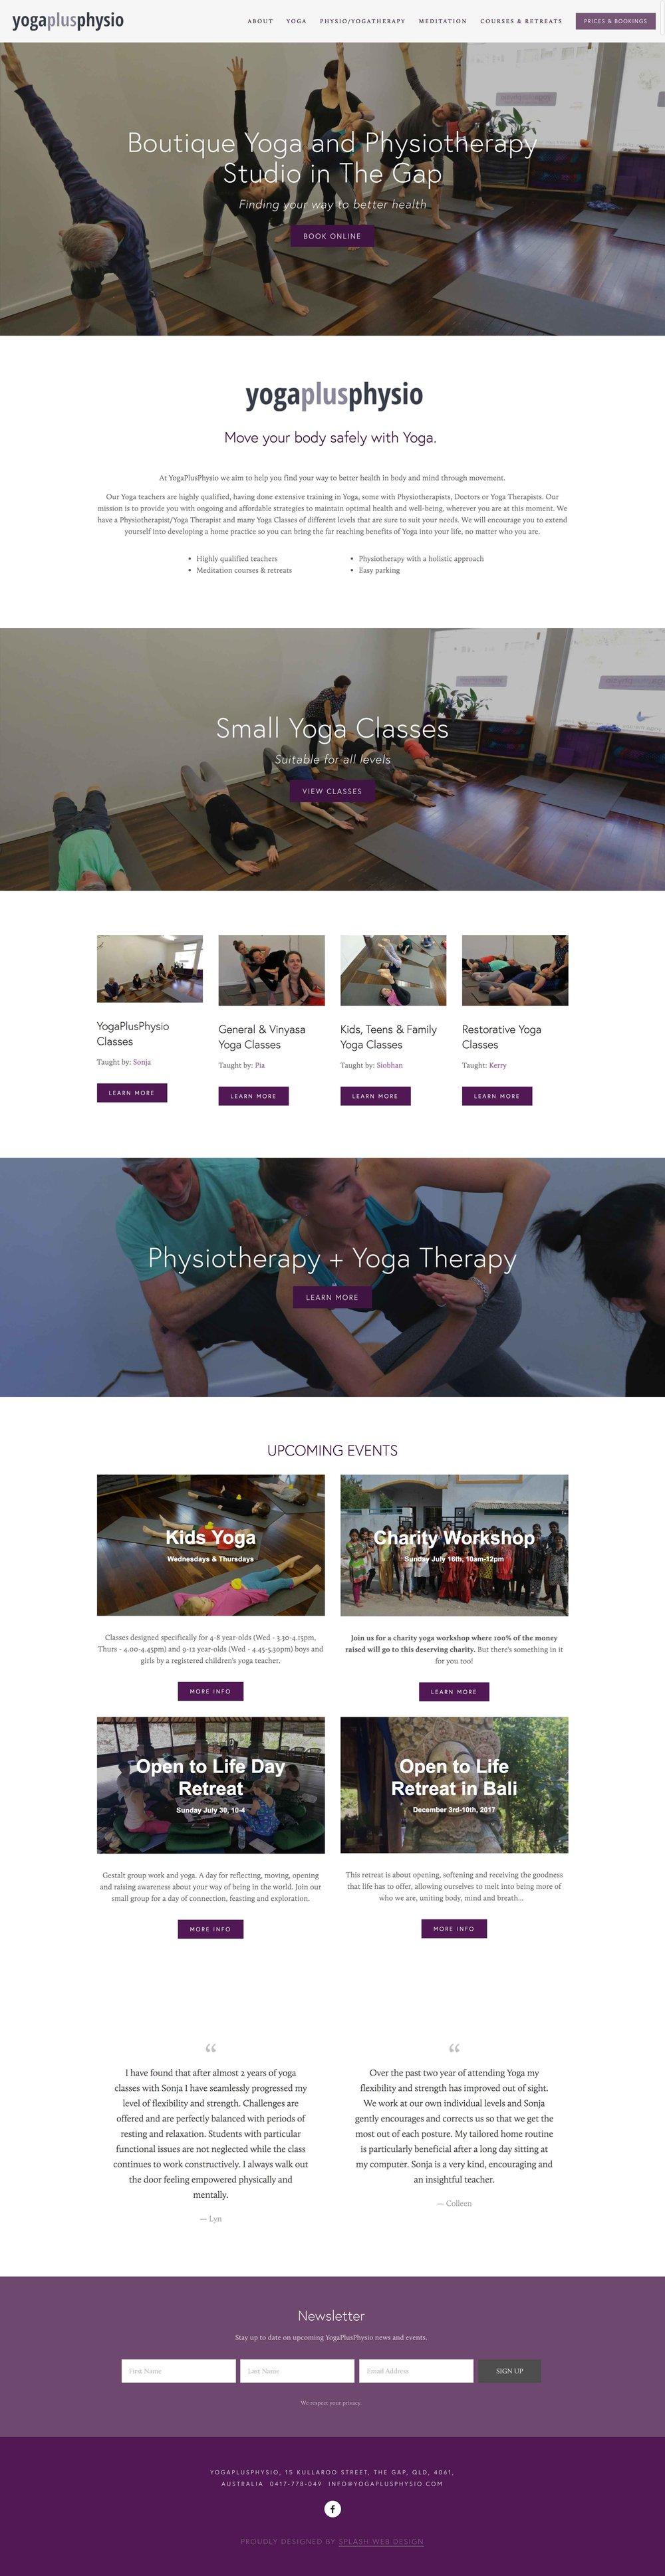 YogaPlusPhysio Preview